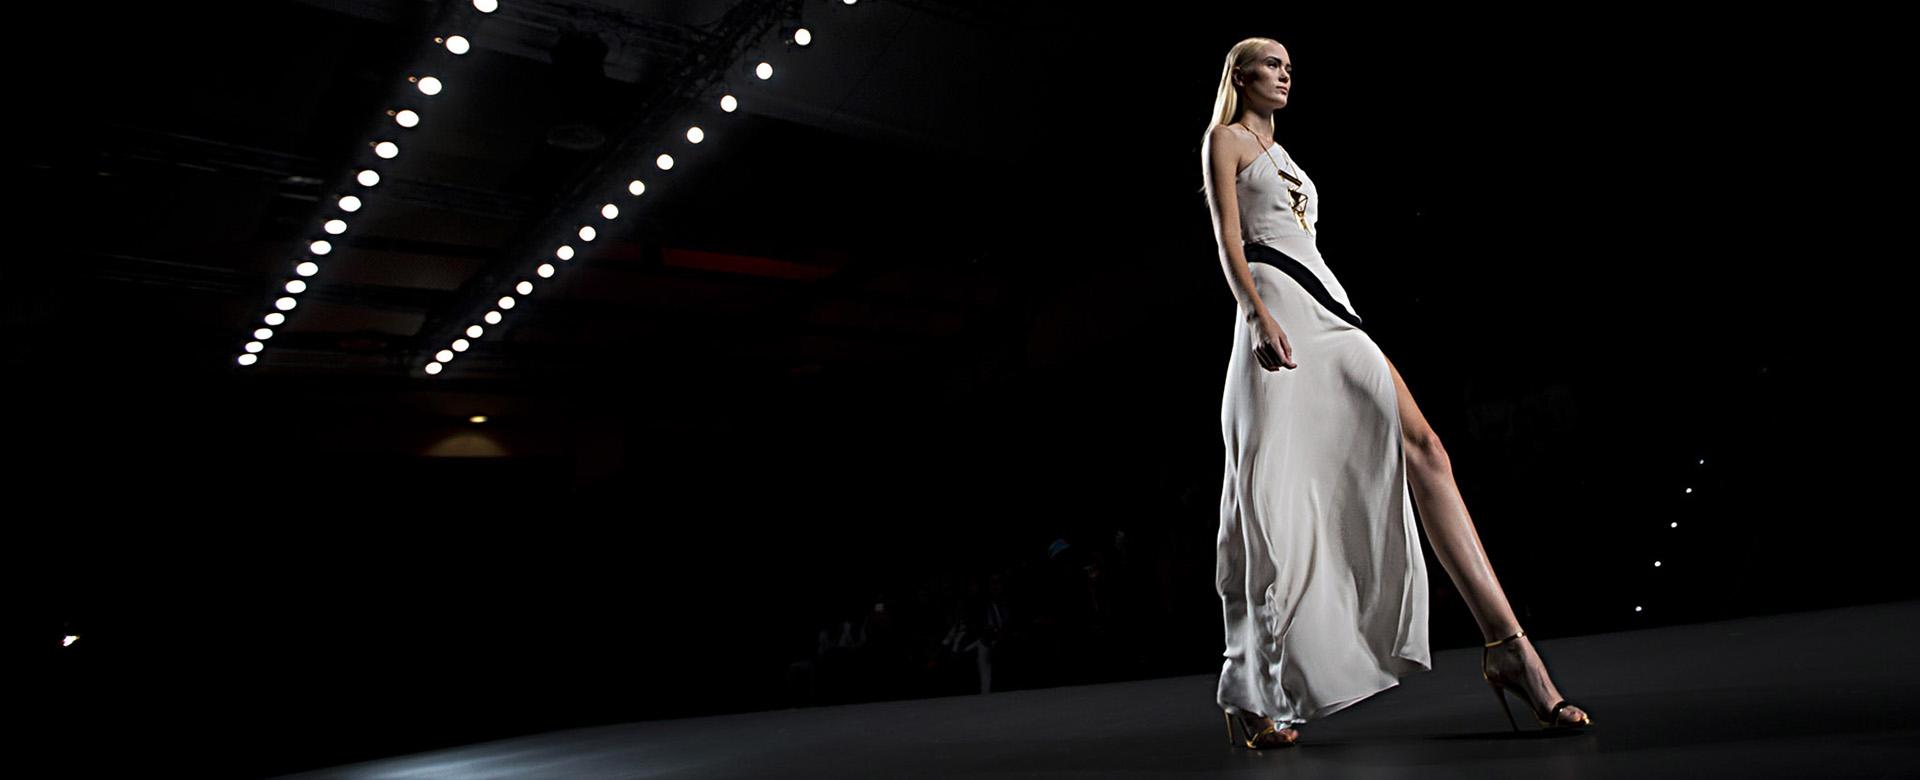 A model displays a Spring/Summer design by Ana Locking during Madrid's Fashion Week, in Madrid, Spain, Friday, Sept. 13, 2013 . (AP Photo/Daniel Ochoa de Olza)